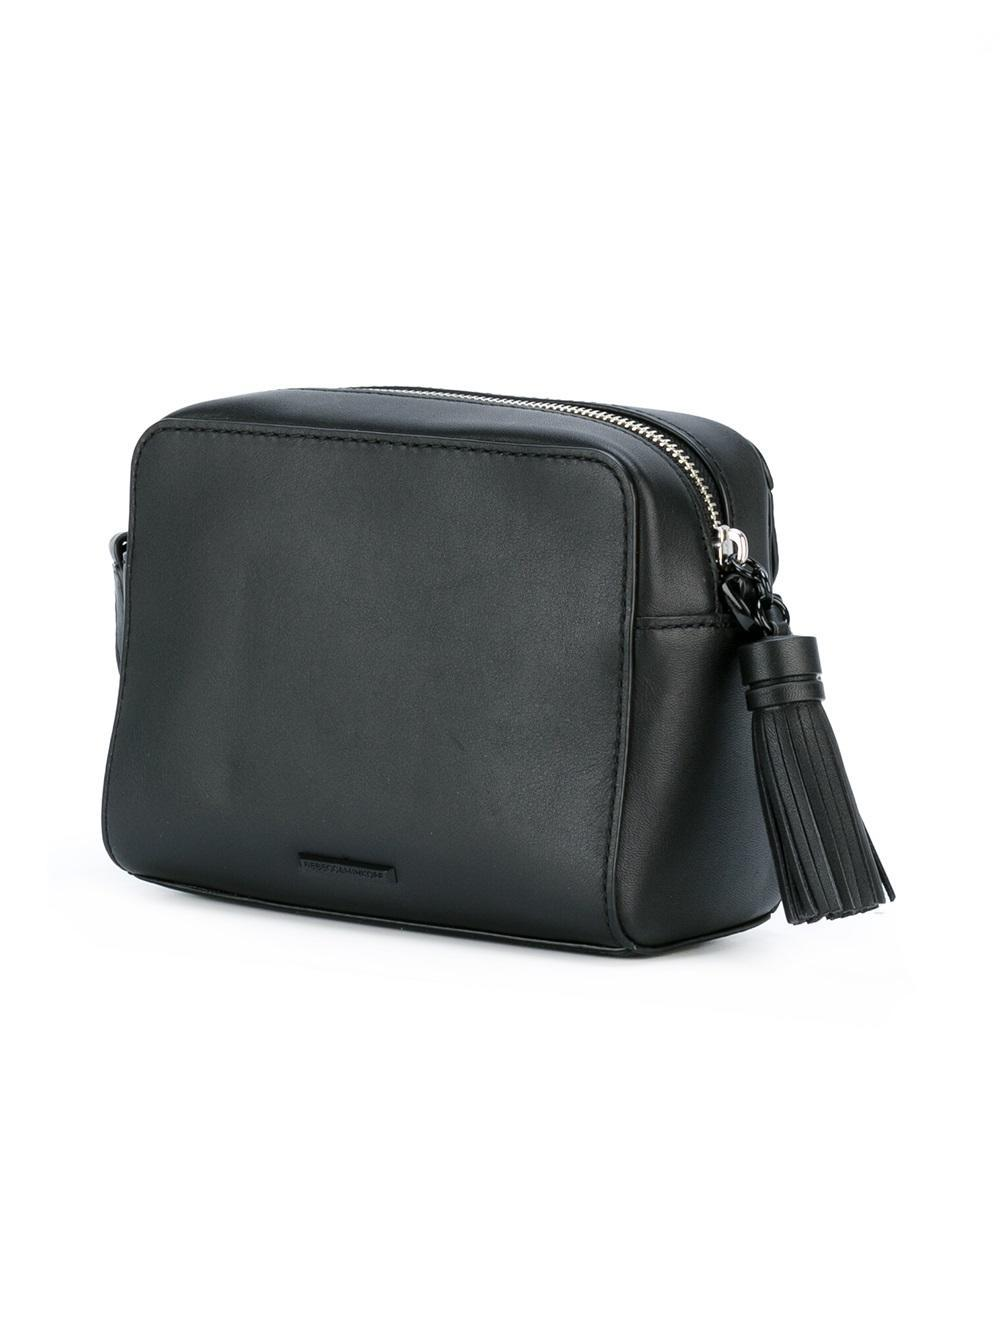 Rebecca Minkoff Leather Lobster Clasp Cross-body Bag in Black